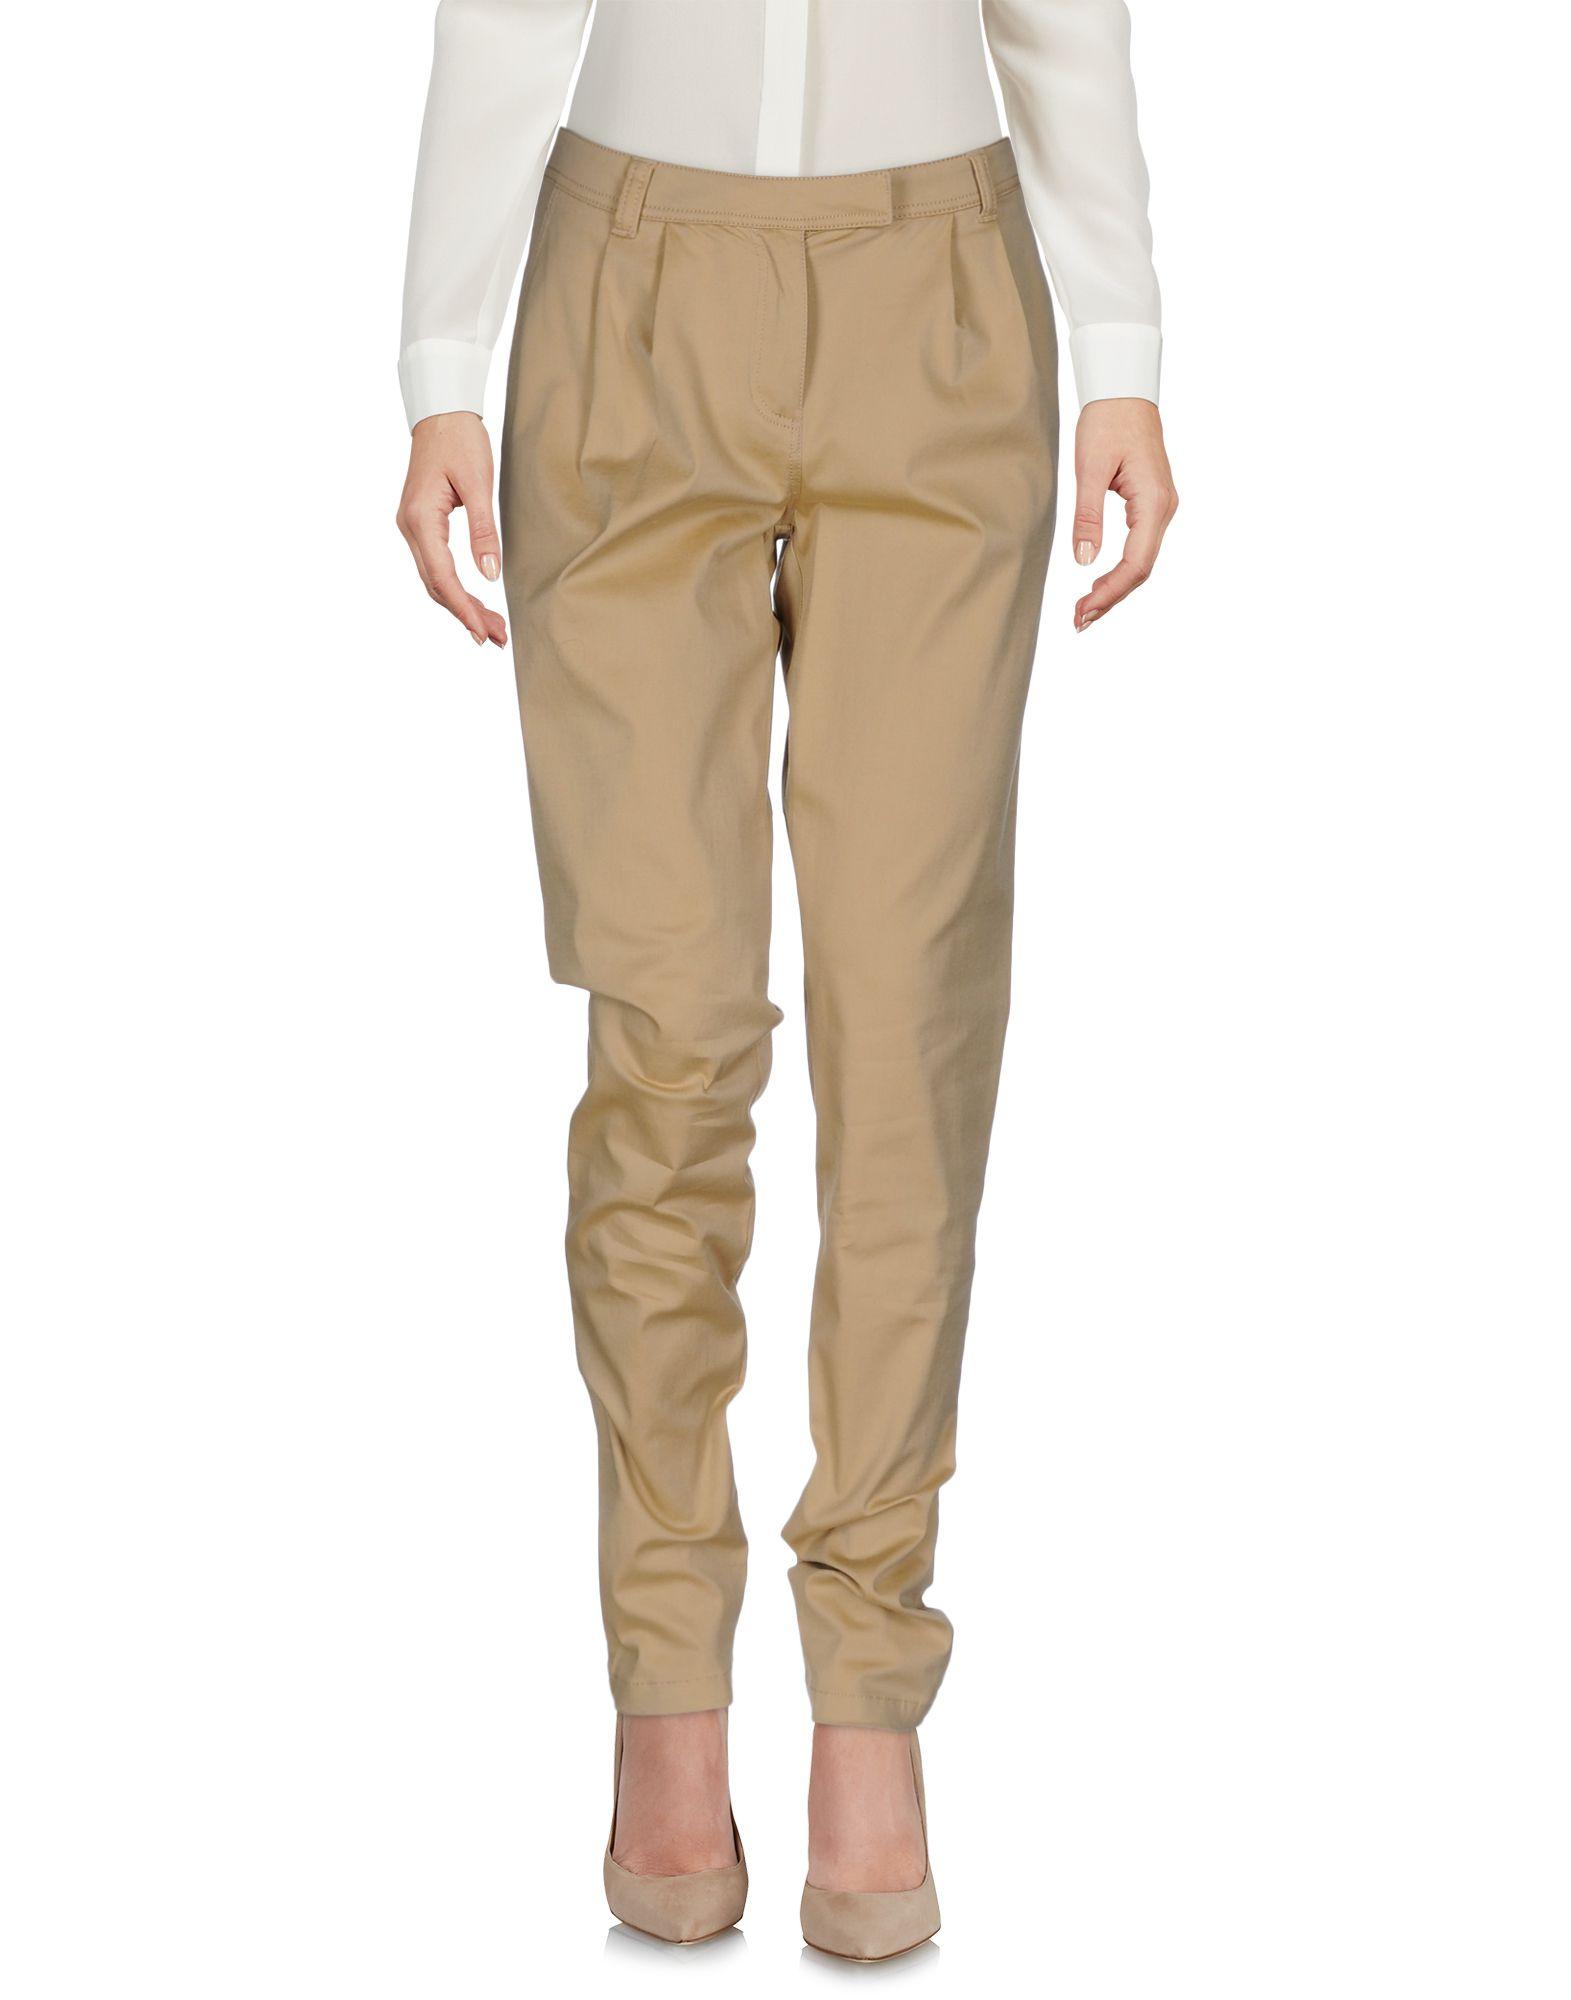 Pantalone Burberry Donna - Acquista online su yhkfq